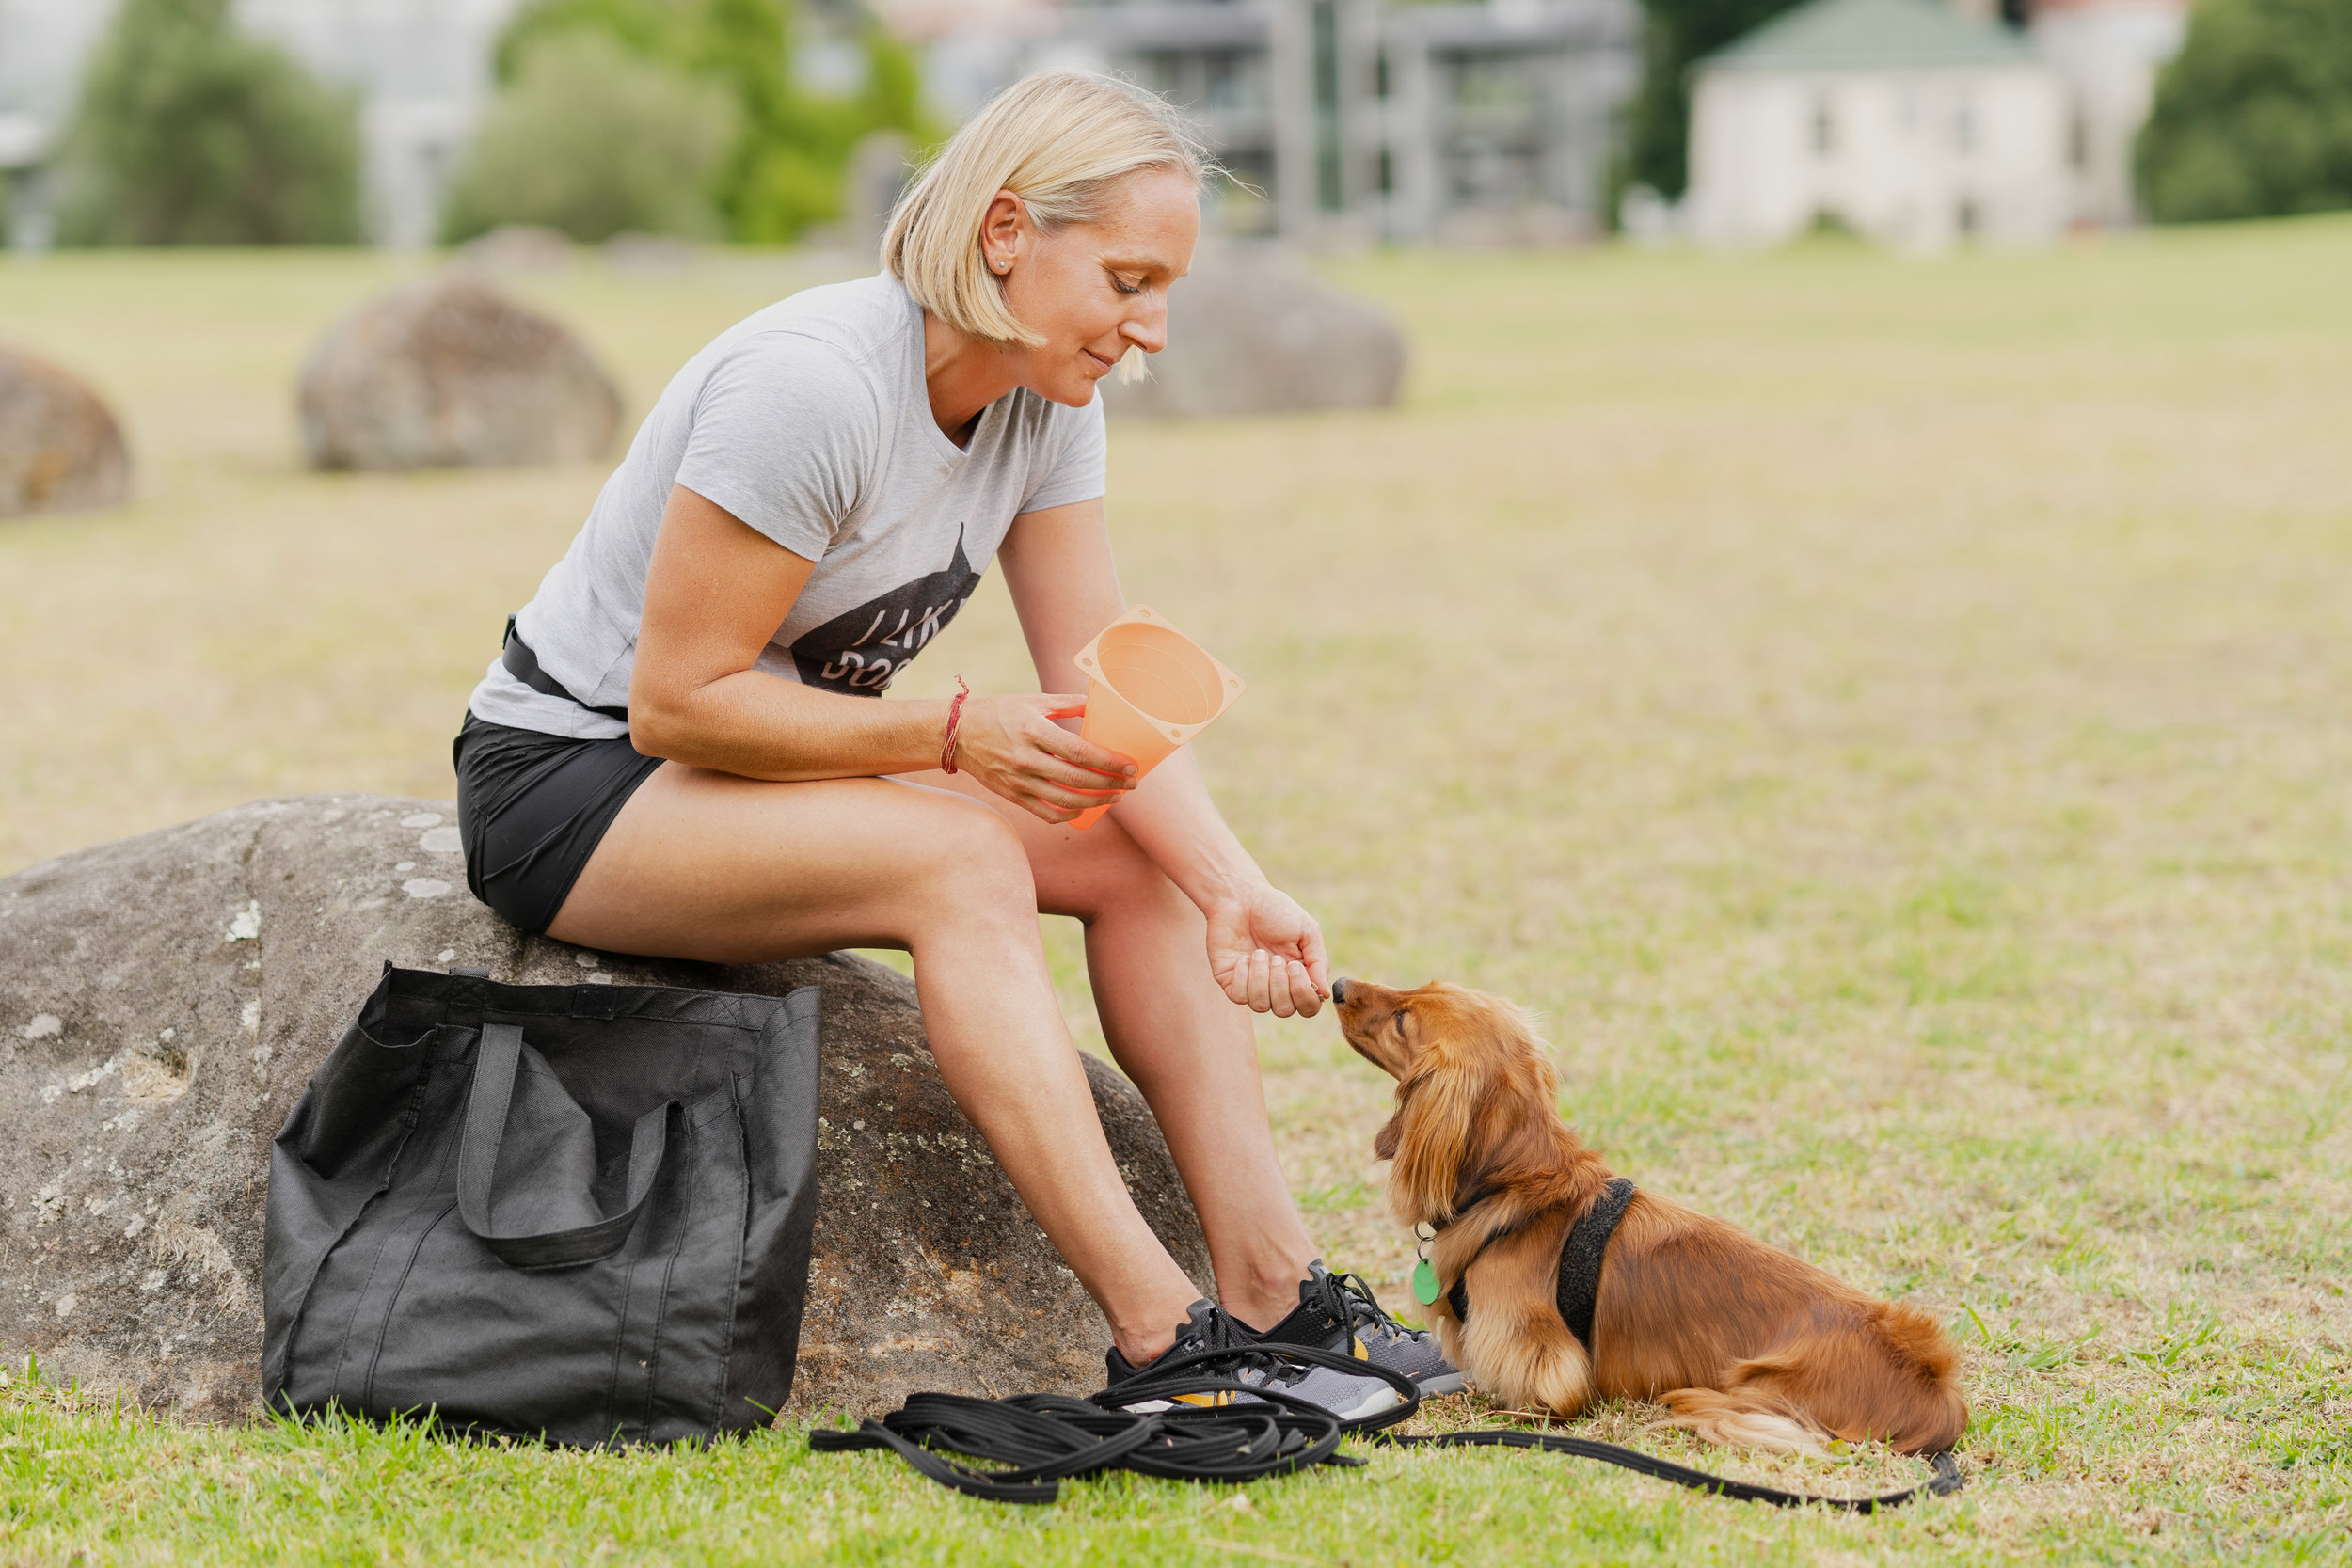 Dog training in park fun